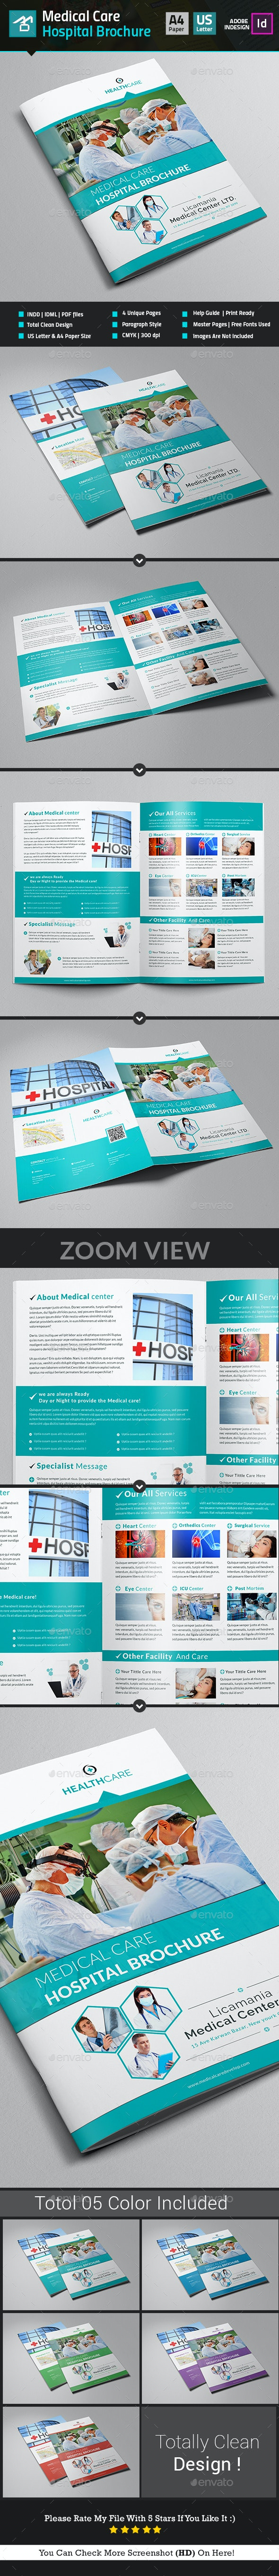 Medical Center / Hospital Brochure Template - Corporate Brochures